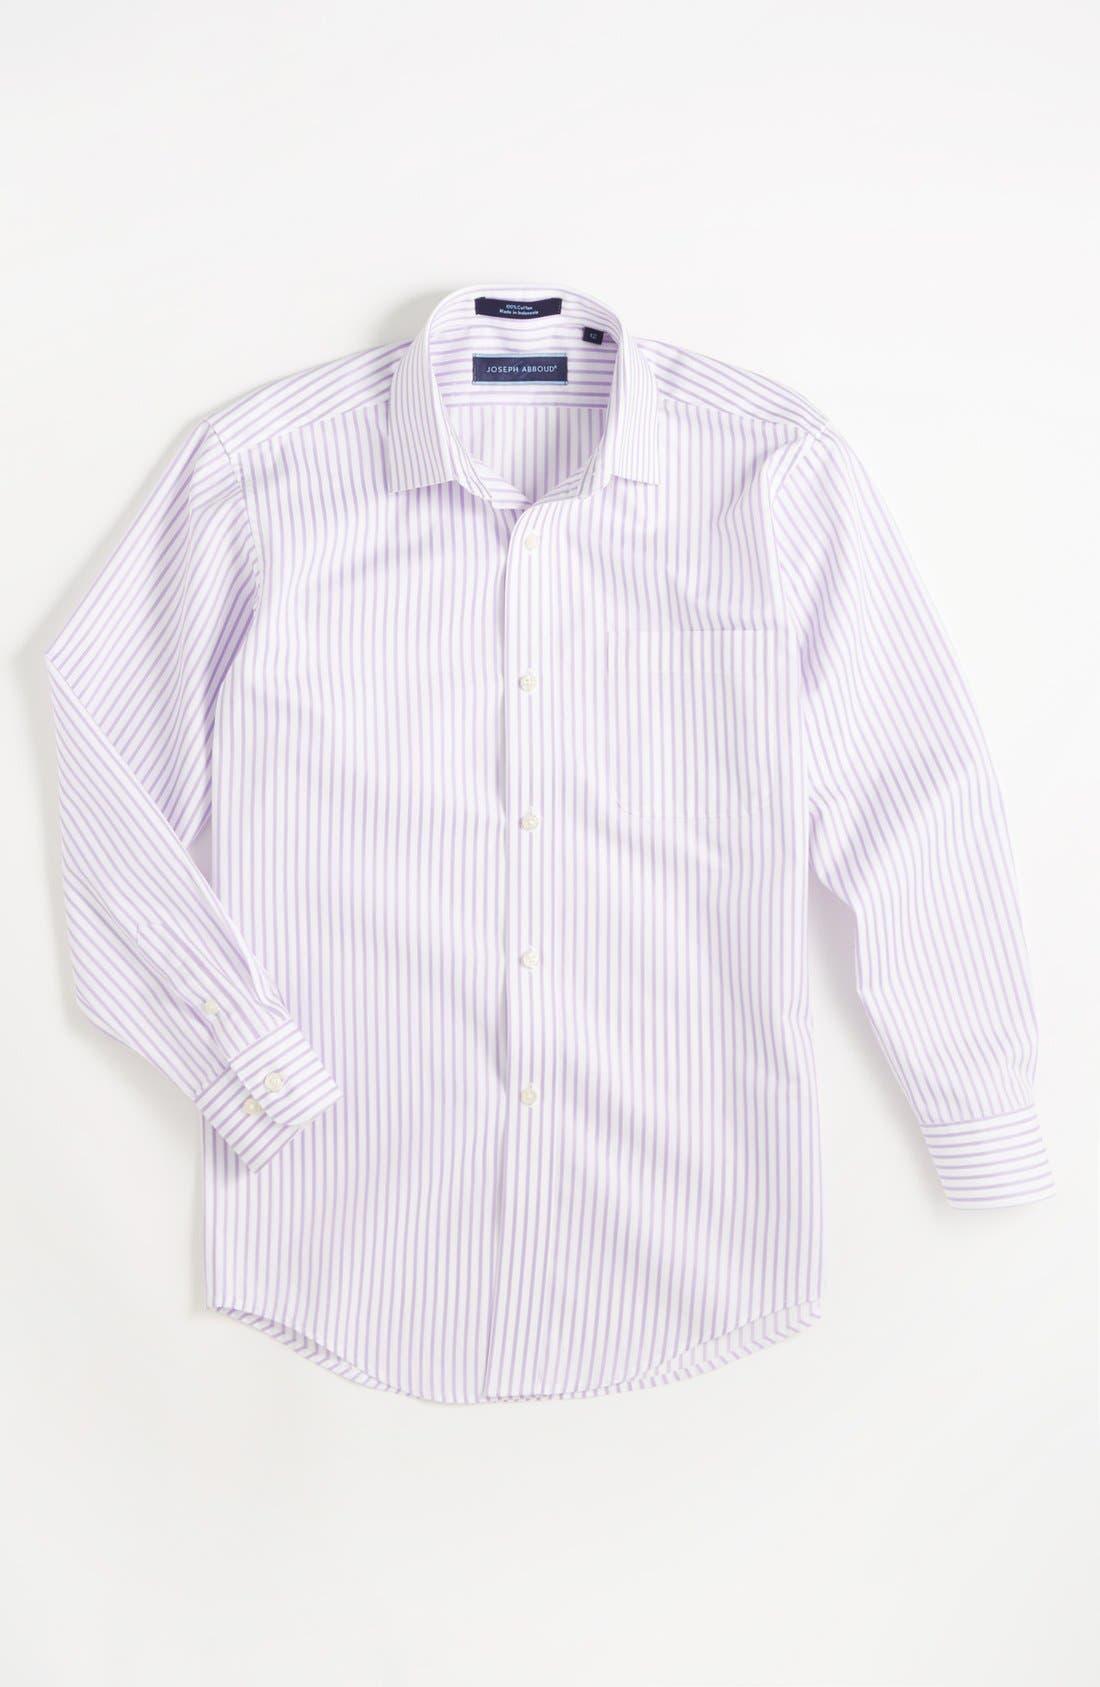 Main Image - Joseph Abboud Dress Shirt (Big Boys)